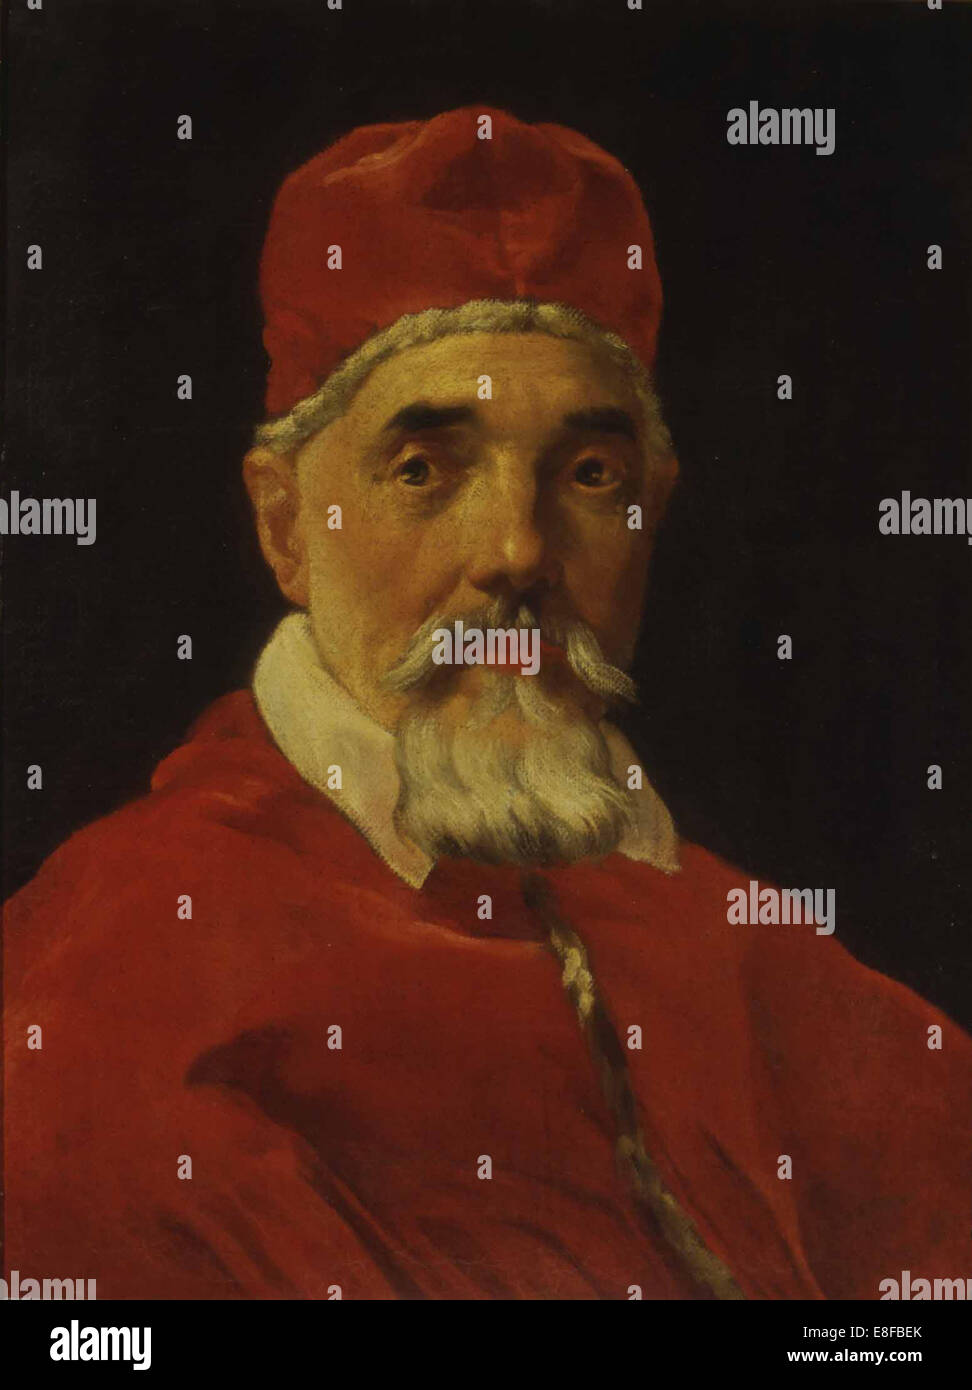 Portrait of Pope Urban VIII. Artist: Bernini, Gianlorenzo (1598-1680) - Stock Image